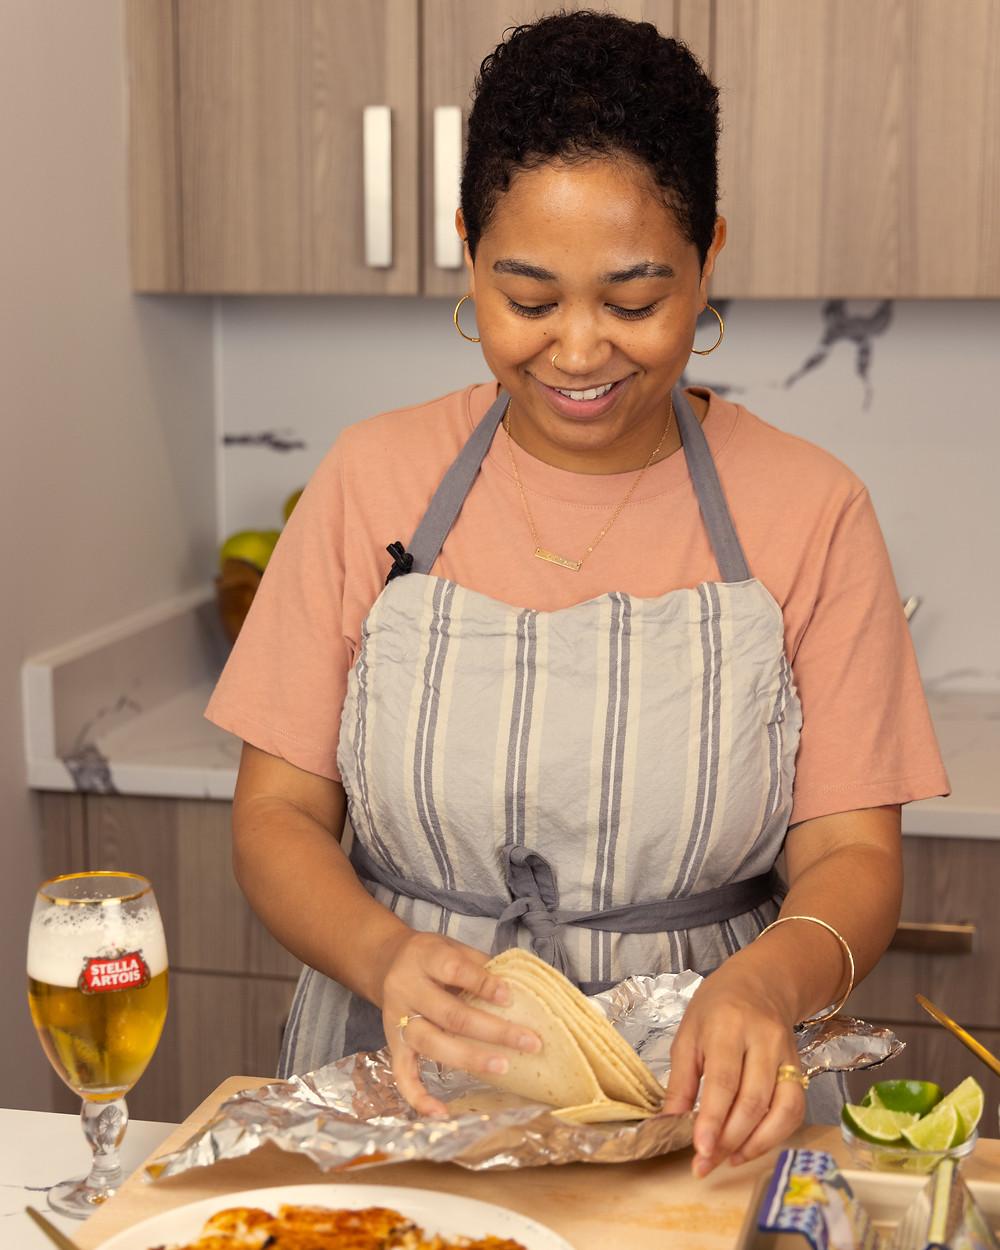 Anela prepares tortillas to go in the oven in foil